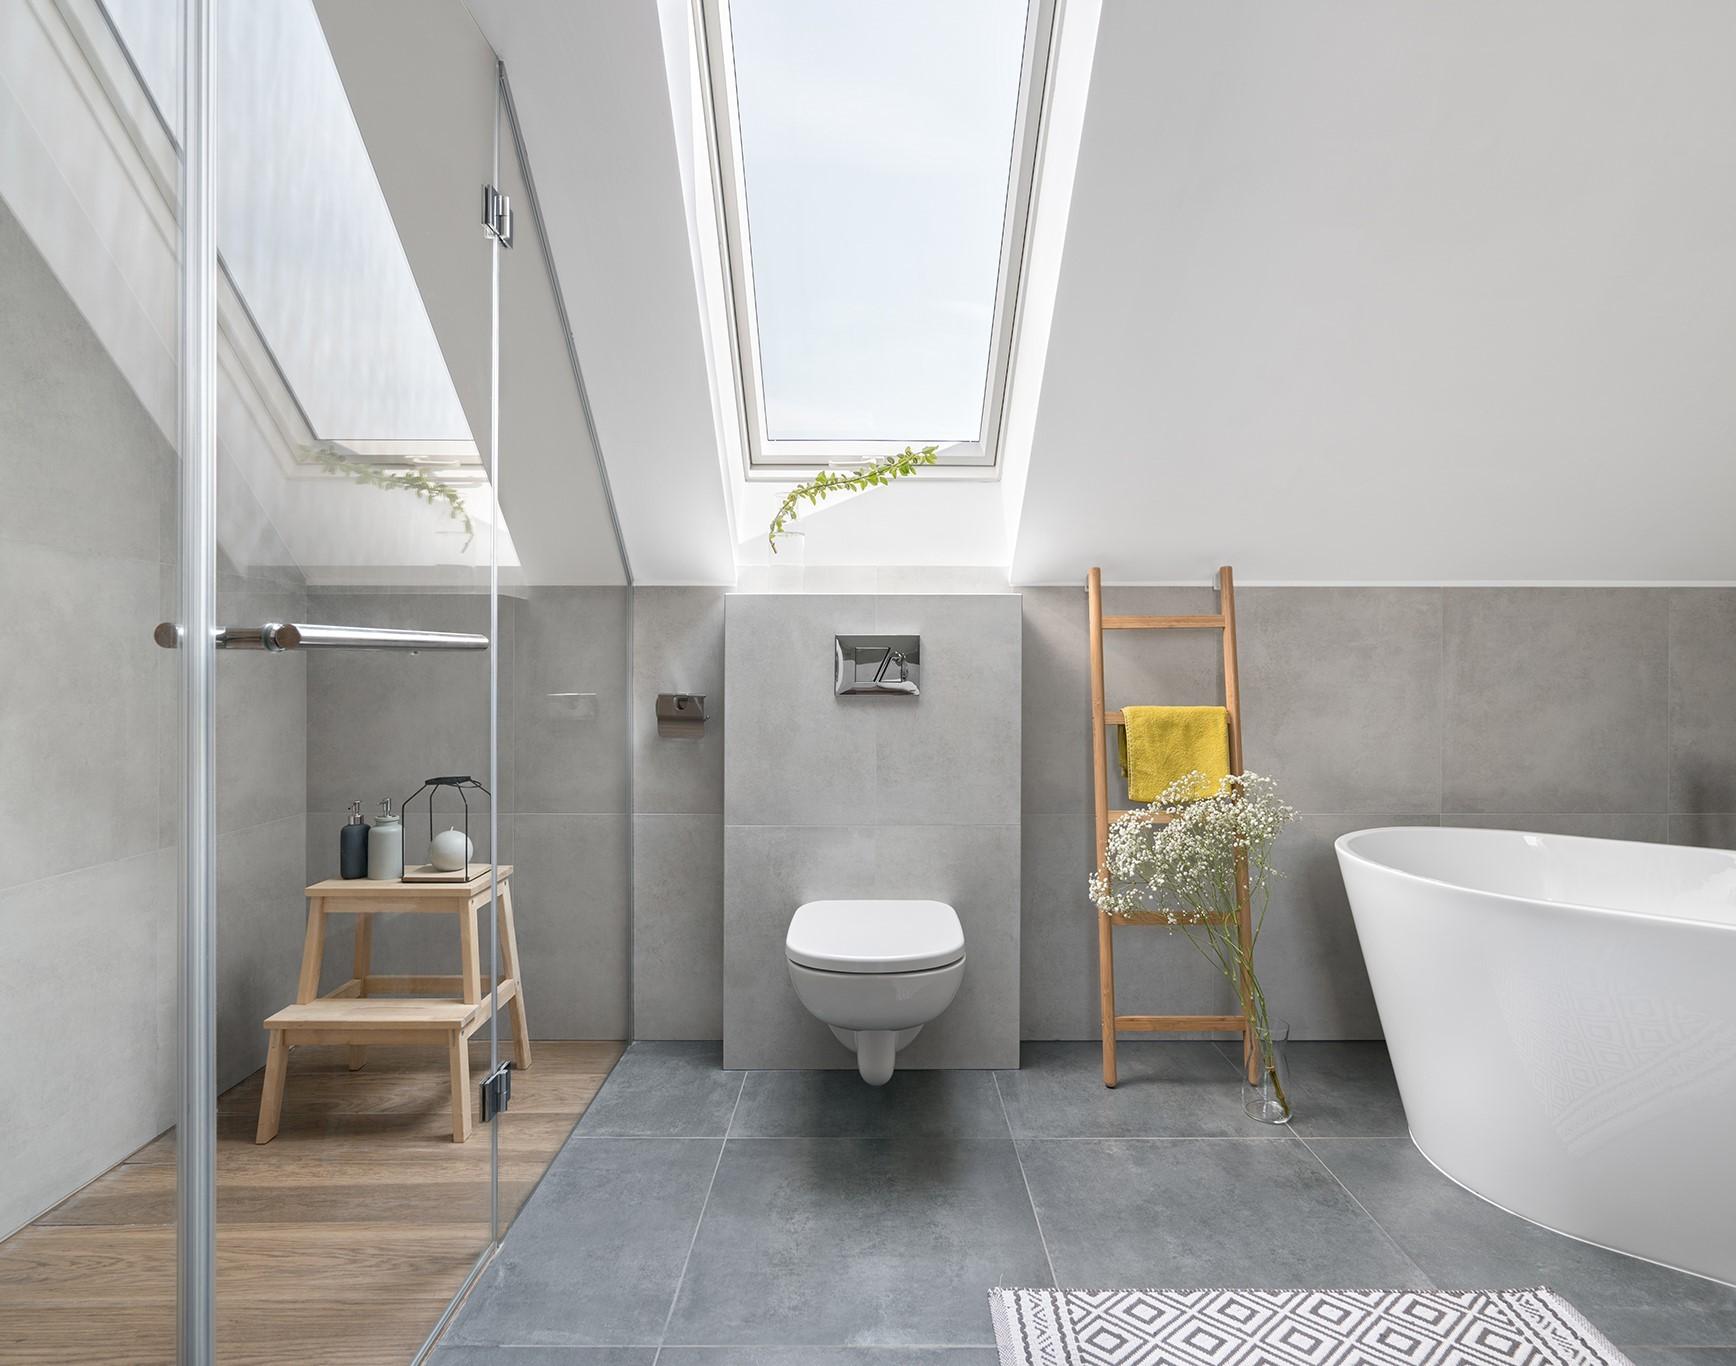 PVC roof window in bathroom